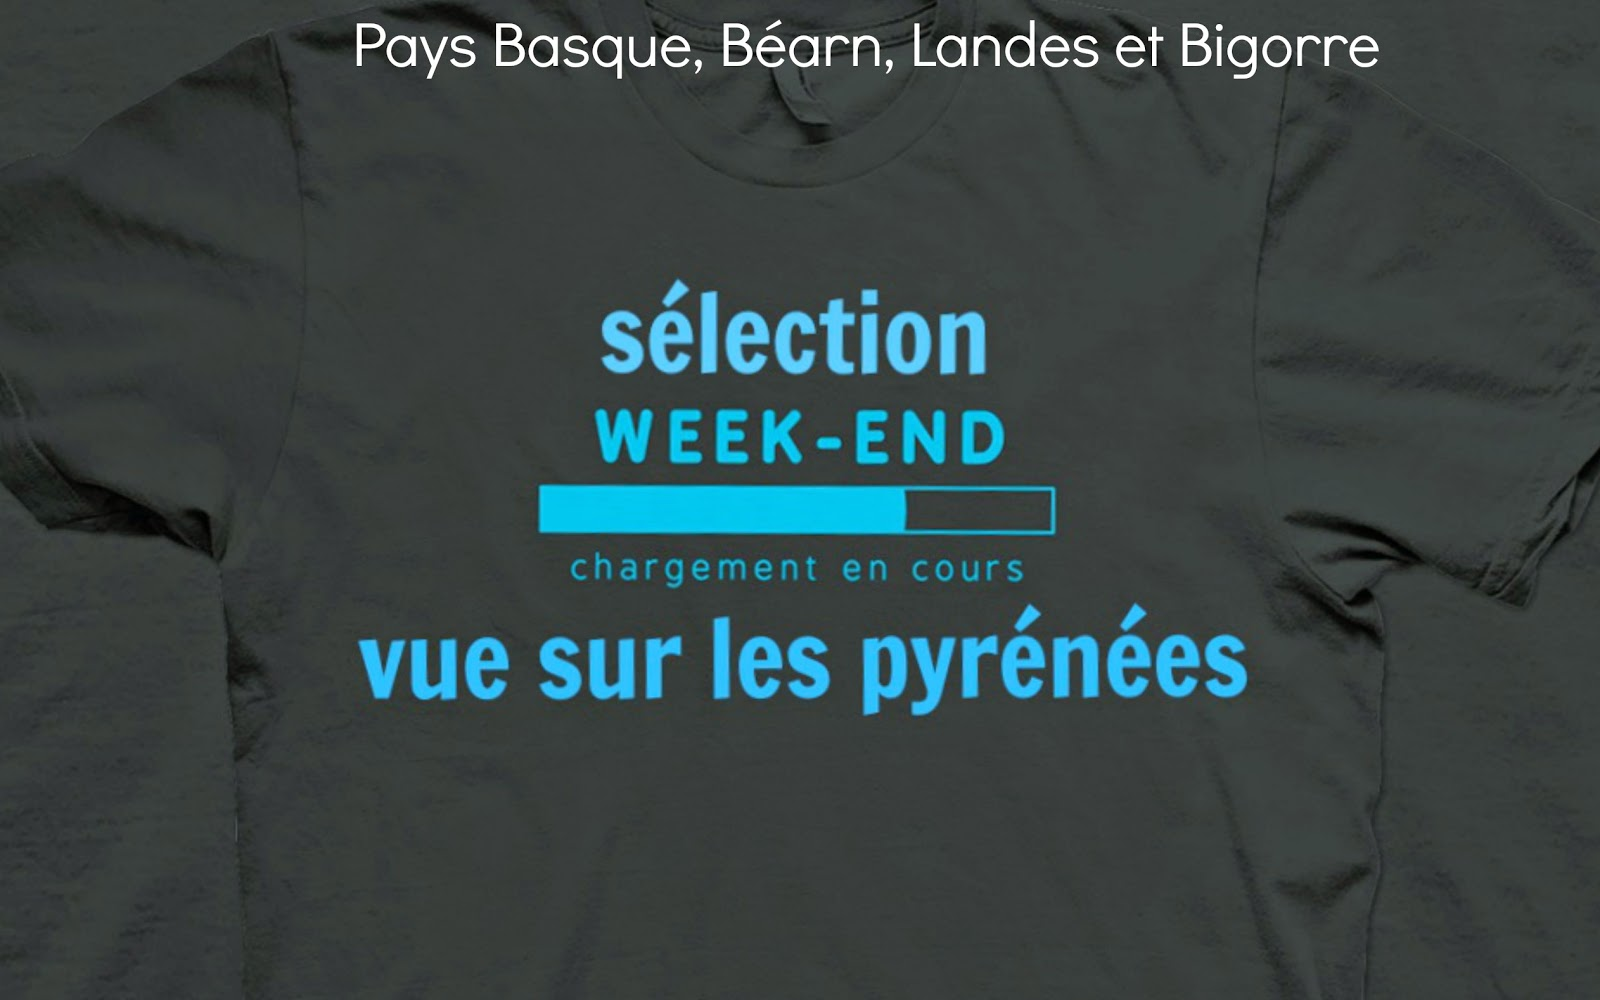 vos sorties en Pyrénées - août 2014